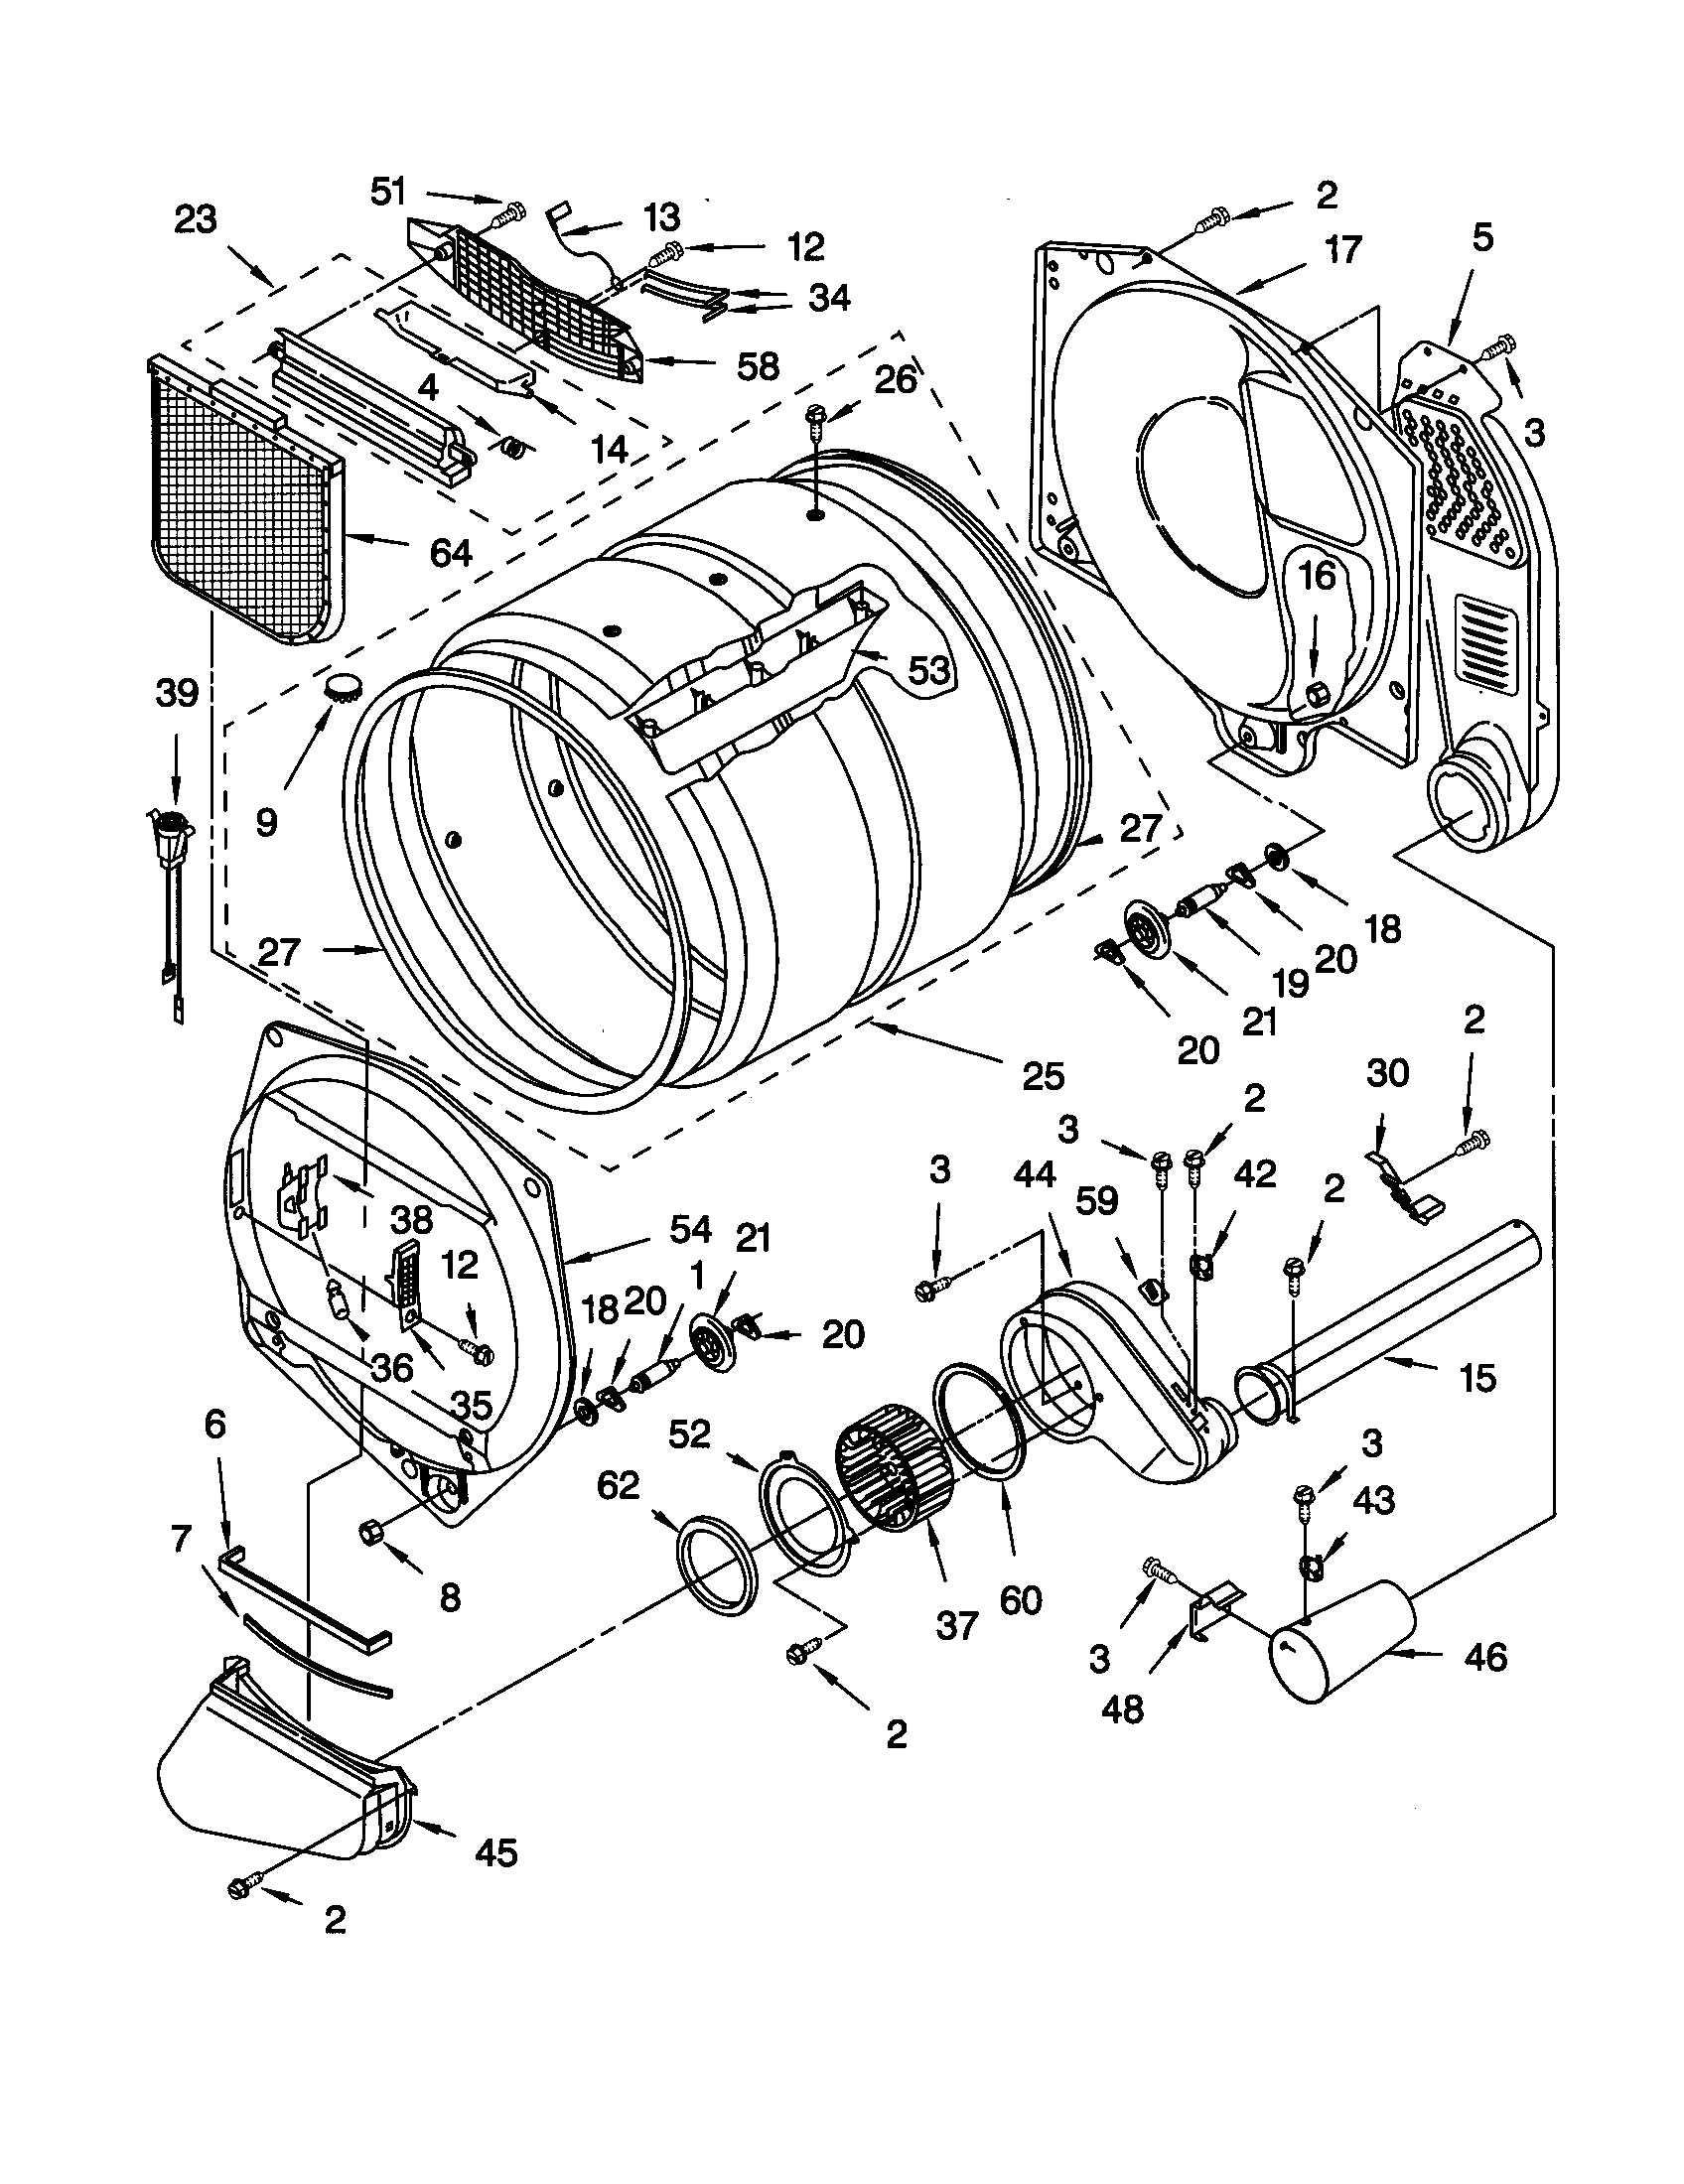 Kenmore Elite Dryer Parts Diagram : kenmore, elite, dryer, parts, diagram, Kenmore, Elite, Dryer, Wiring, Schematic, Garmin, Diagram, Polarisss.tukune.jeanjaures37.fr